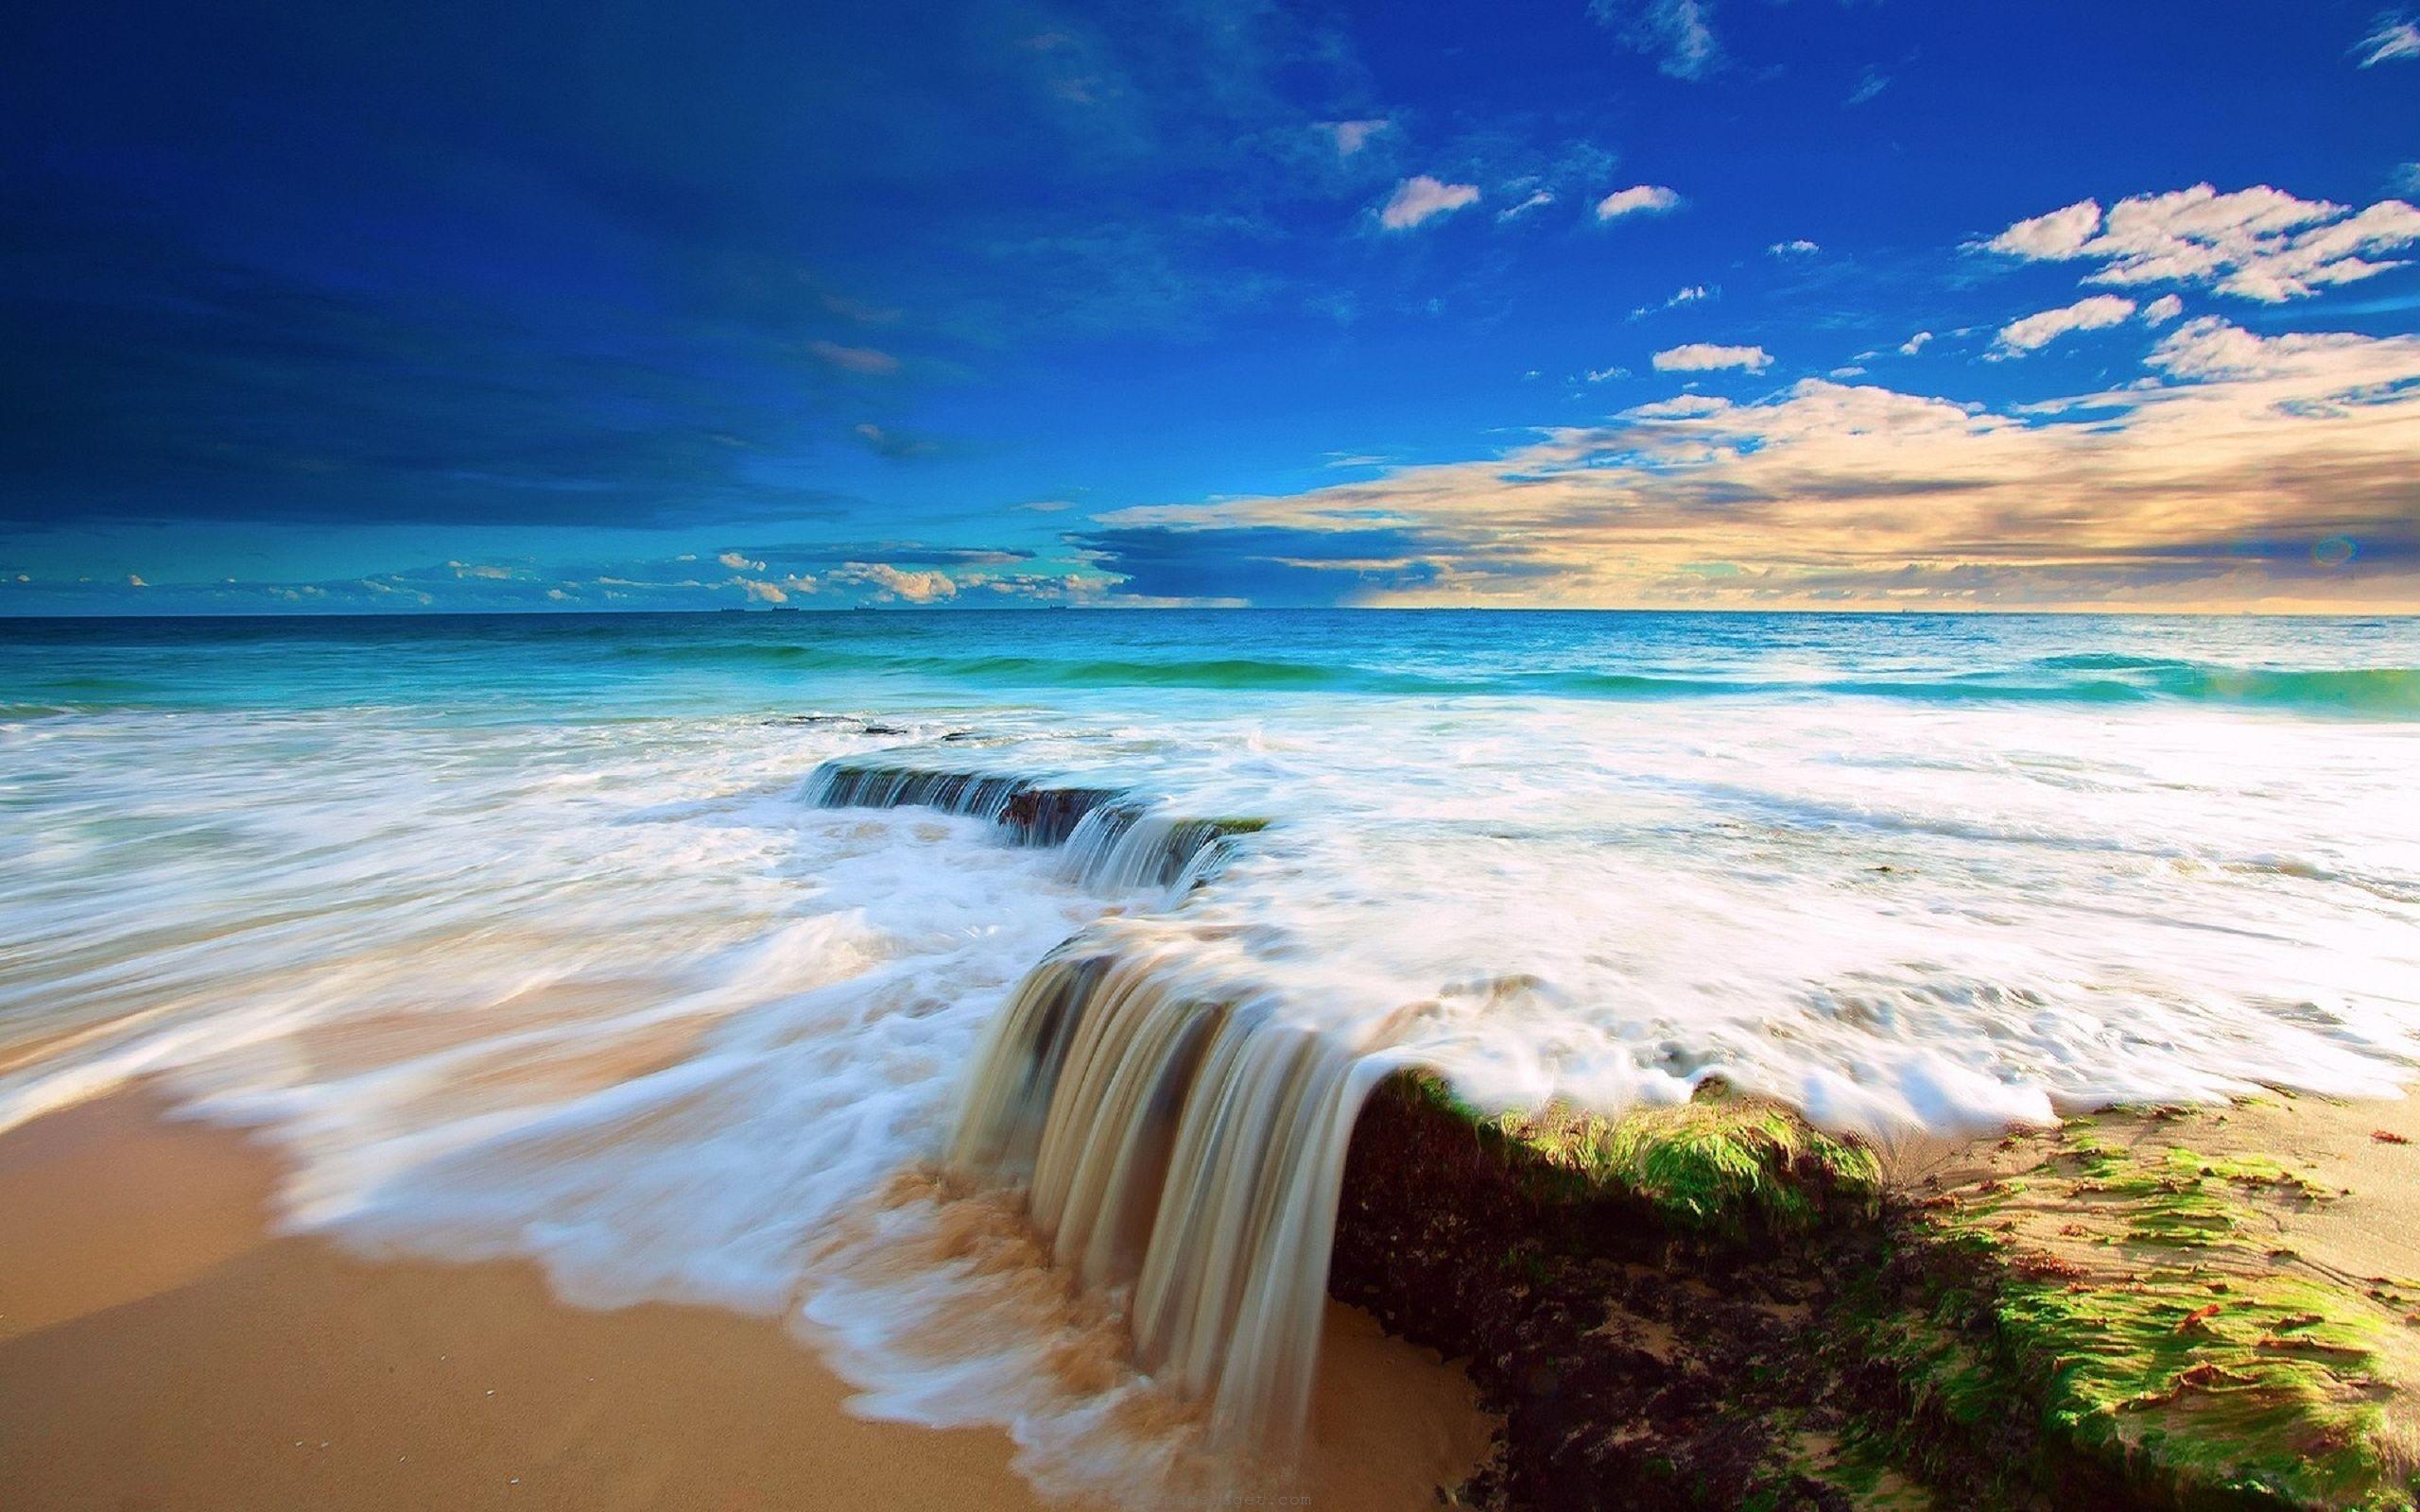 Beach Ocean Waves Water Favim Com HD dekstop wallpapers   Beach Ocean 2560x1600